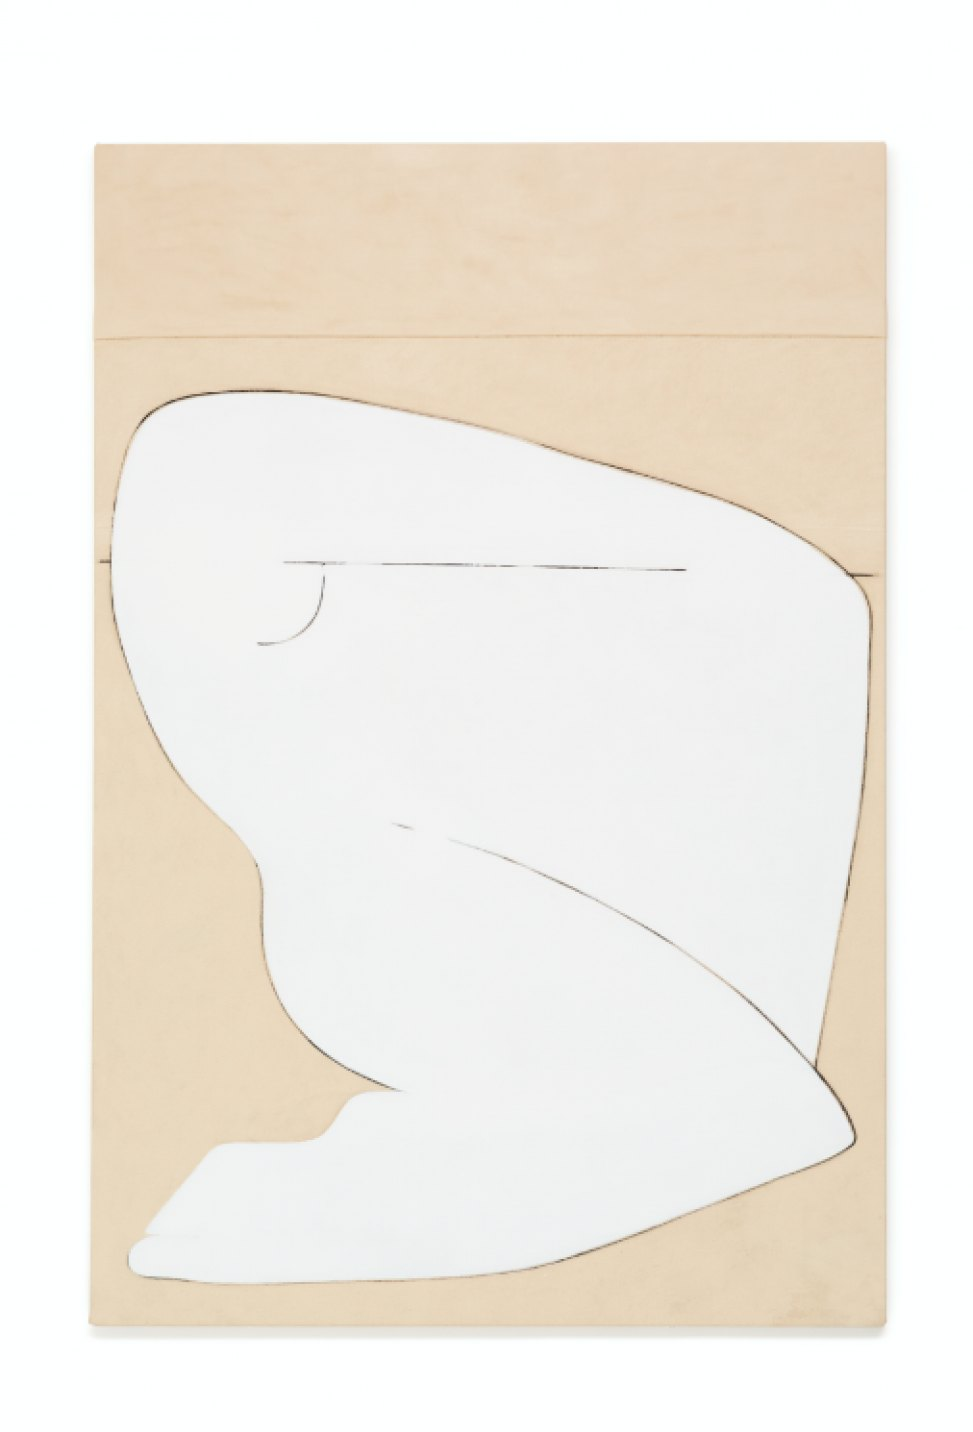 Julie Beaufils, <em>Modern amazone 2</em>, 2017, acrylic and ink on canvas, 130 × 195 cm - Mendes Wood DM